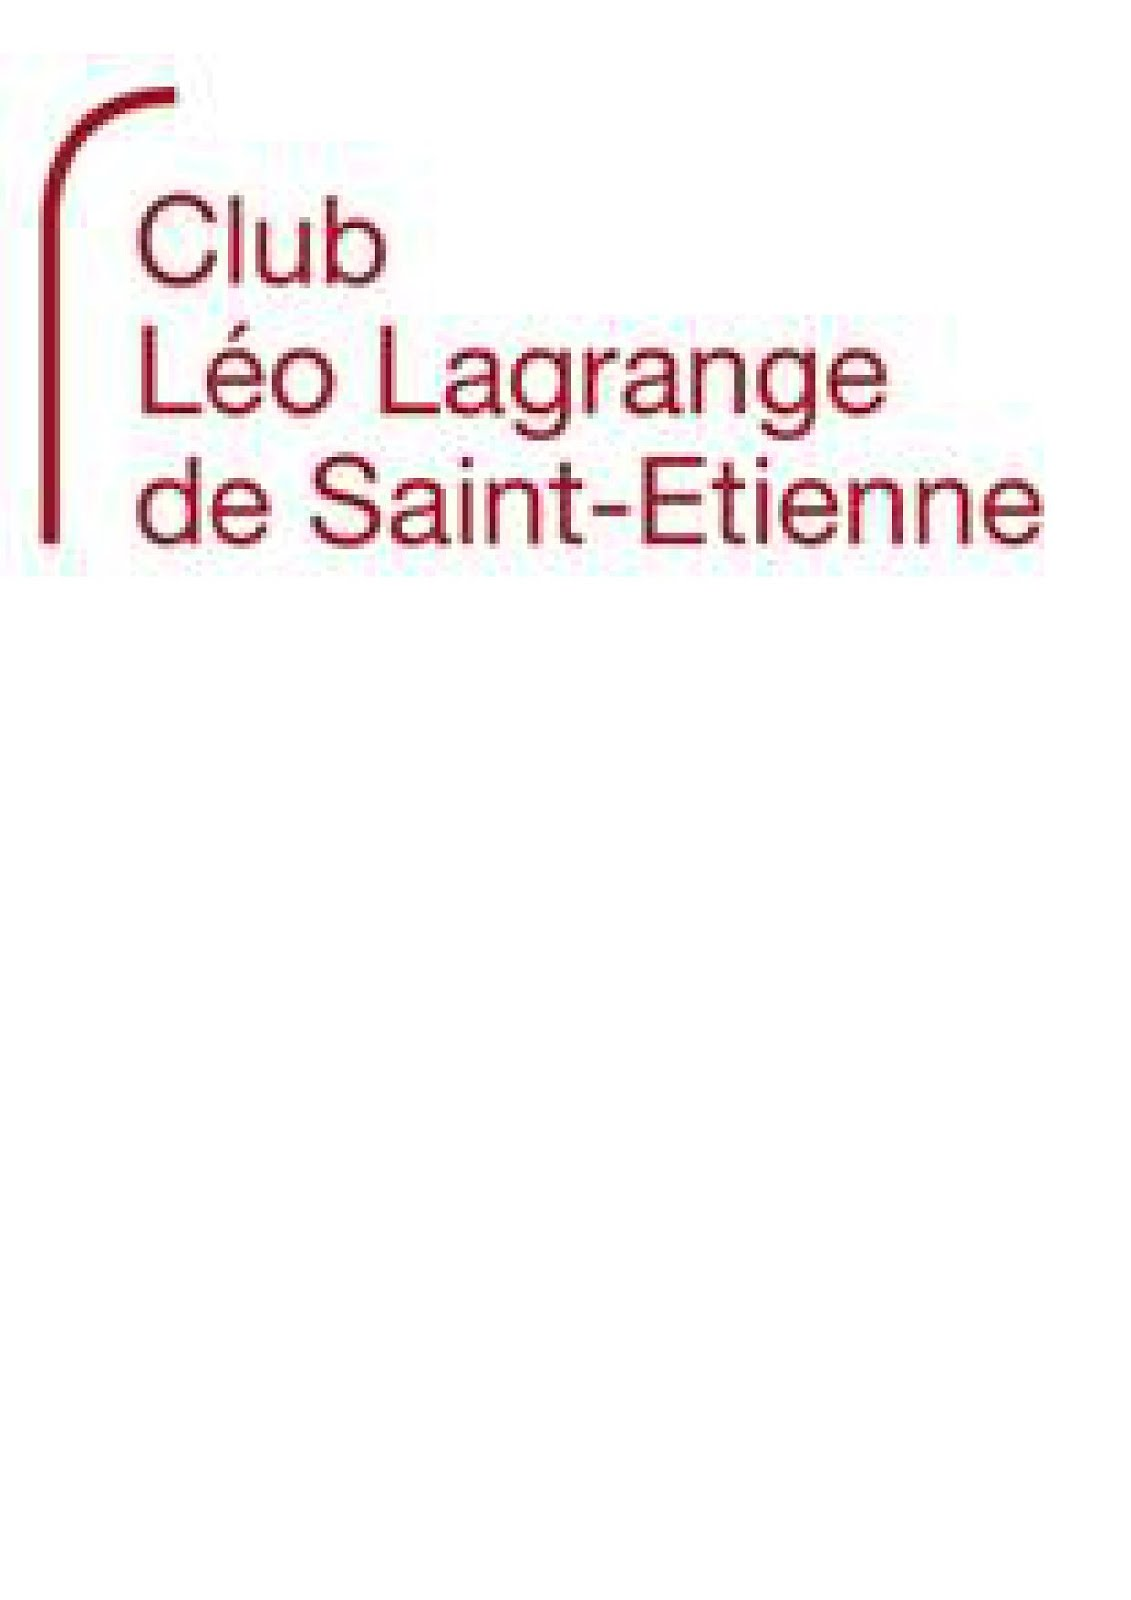 CLL Saint-Etienne